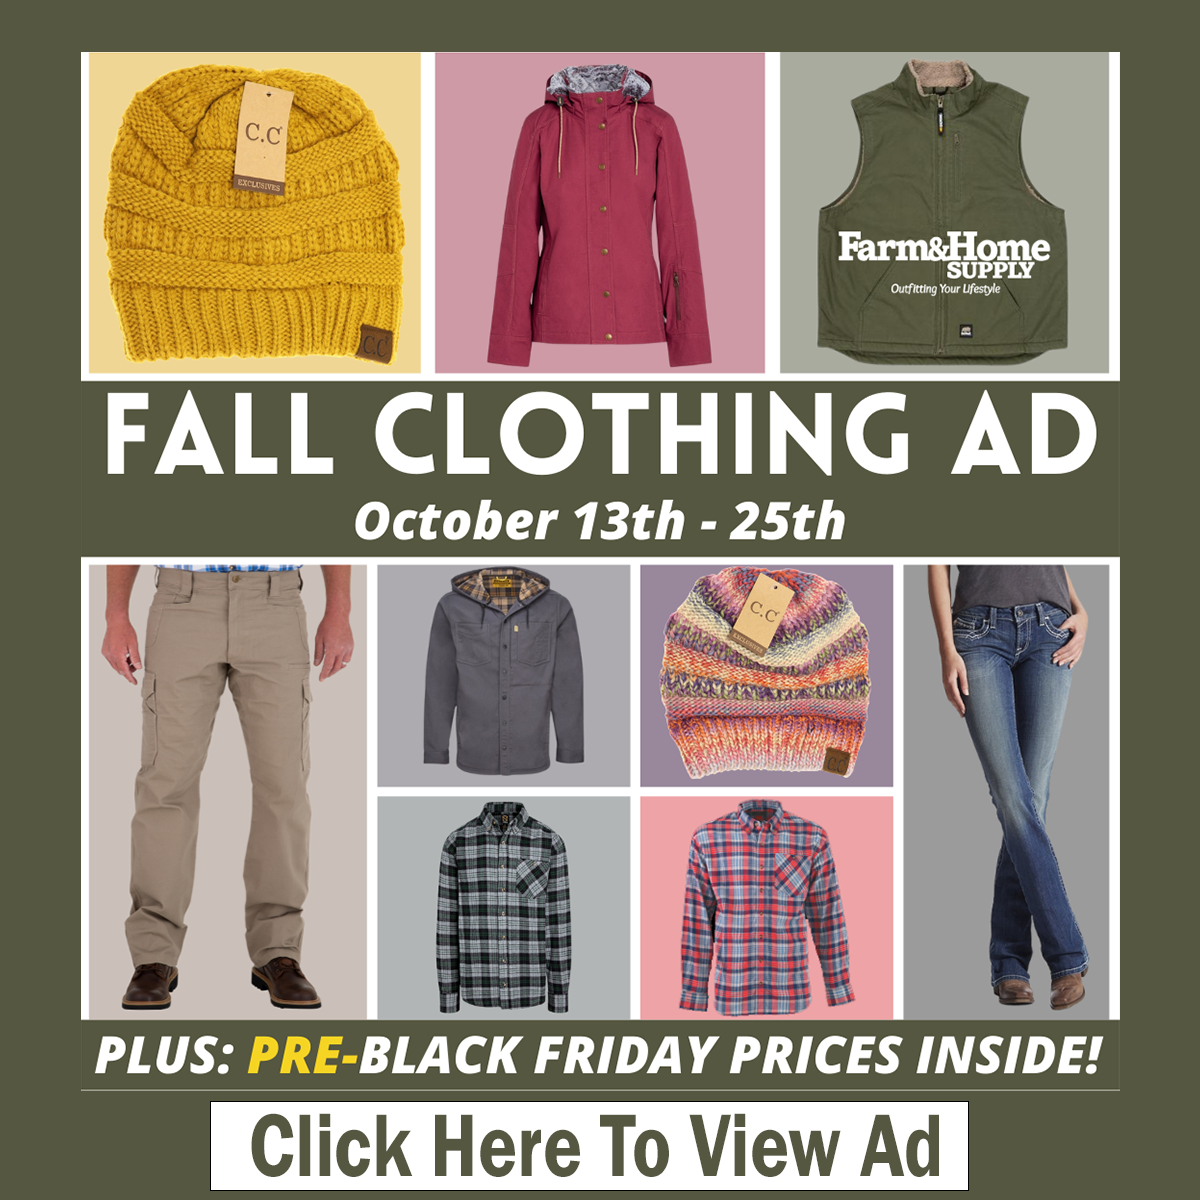 Annual Fall Clothing